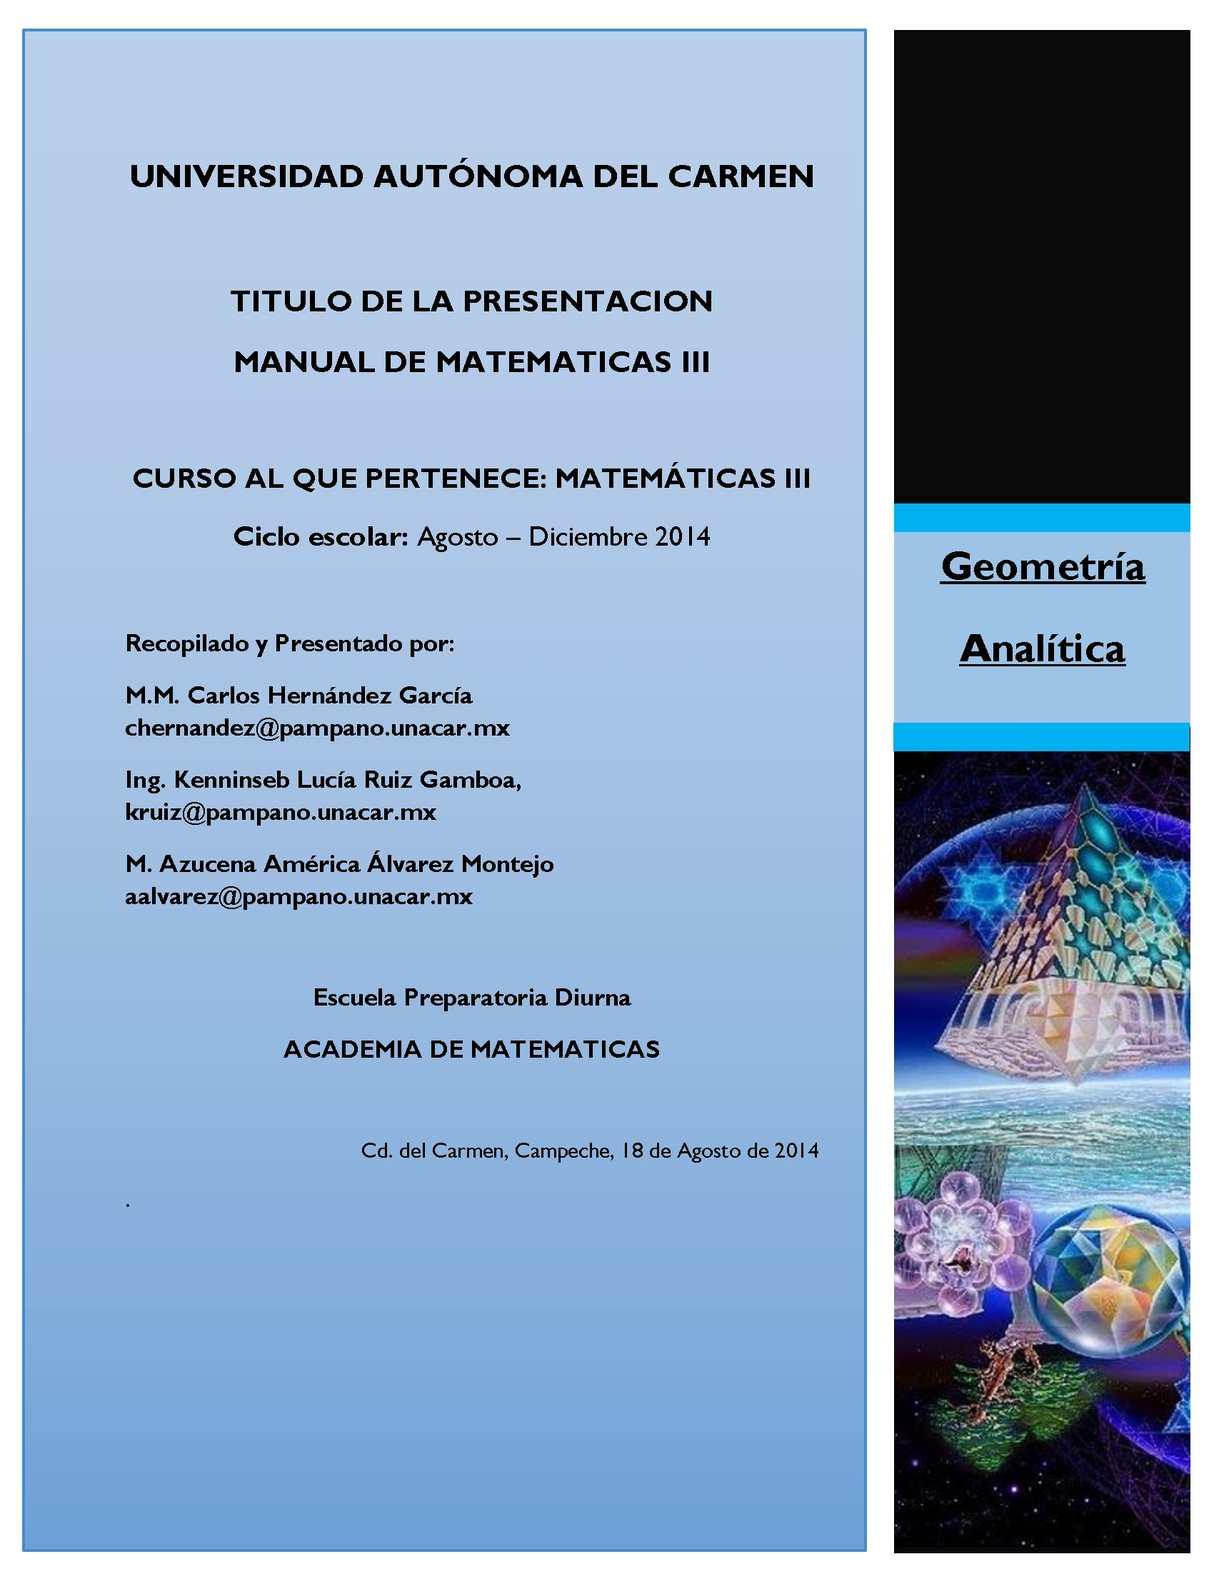 Manual de Matemáticas III Geometría Analítica Agosto 2014